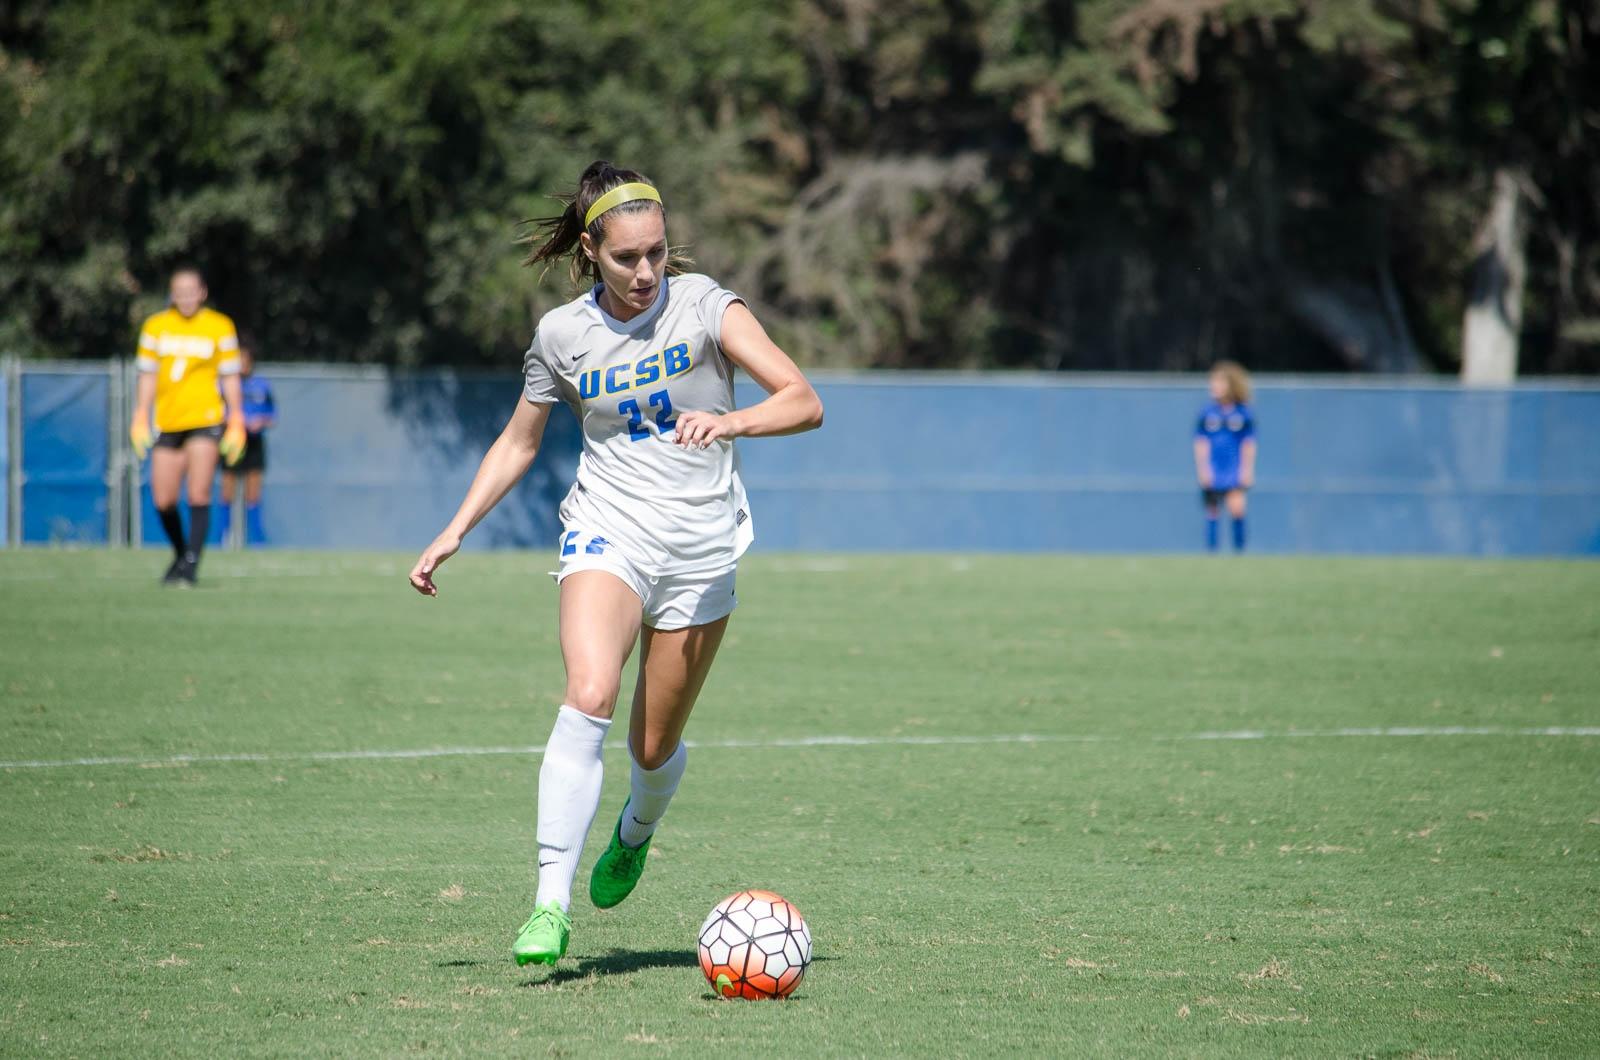 Savannah Francis takes the ball toward the goal. Christina DeMarzo / Daily Nexus